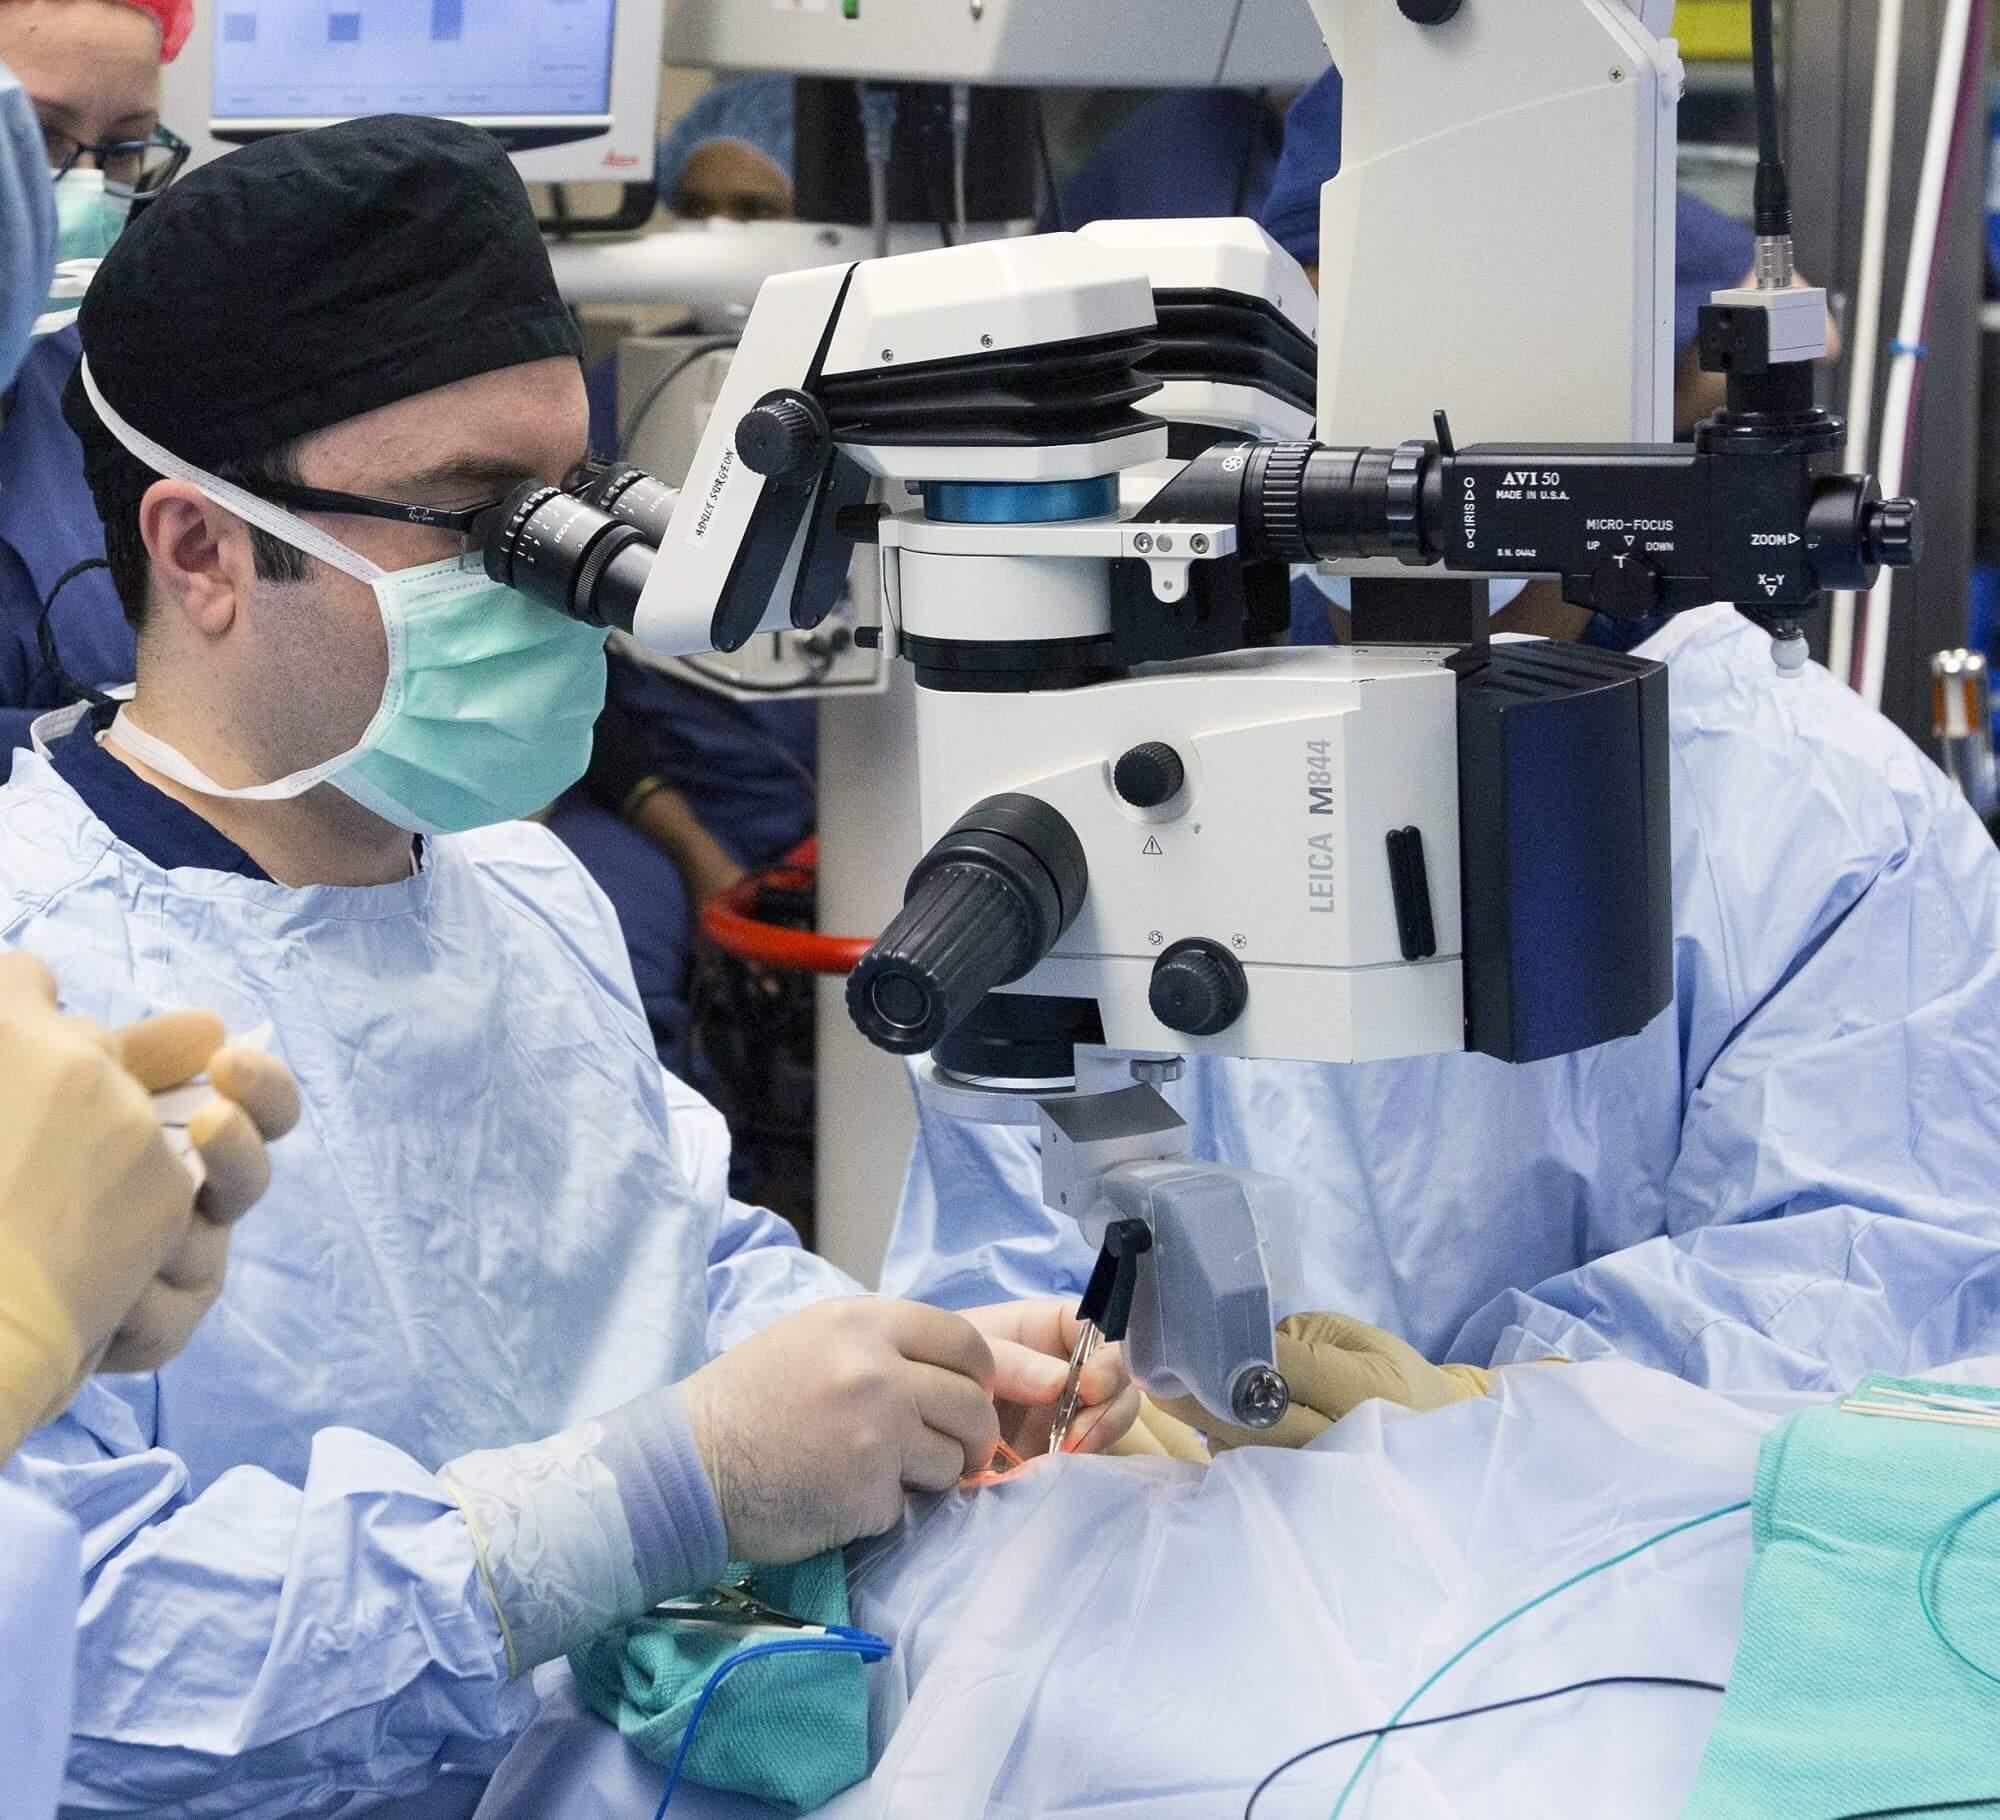 Dr. Amir Mohsenin implanting a bionic eye, the Argus ll, in Lidia Lopez at Memorial Hermann.